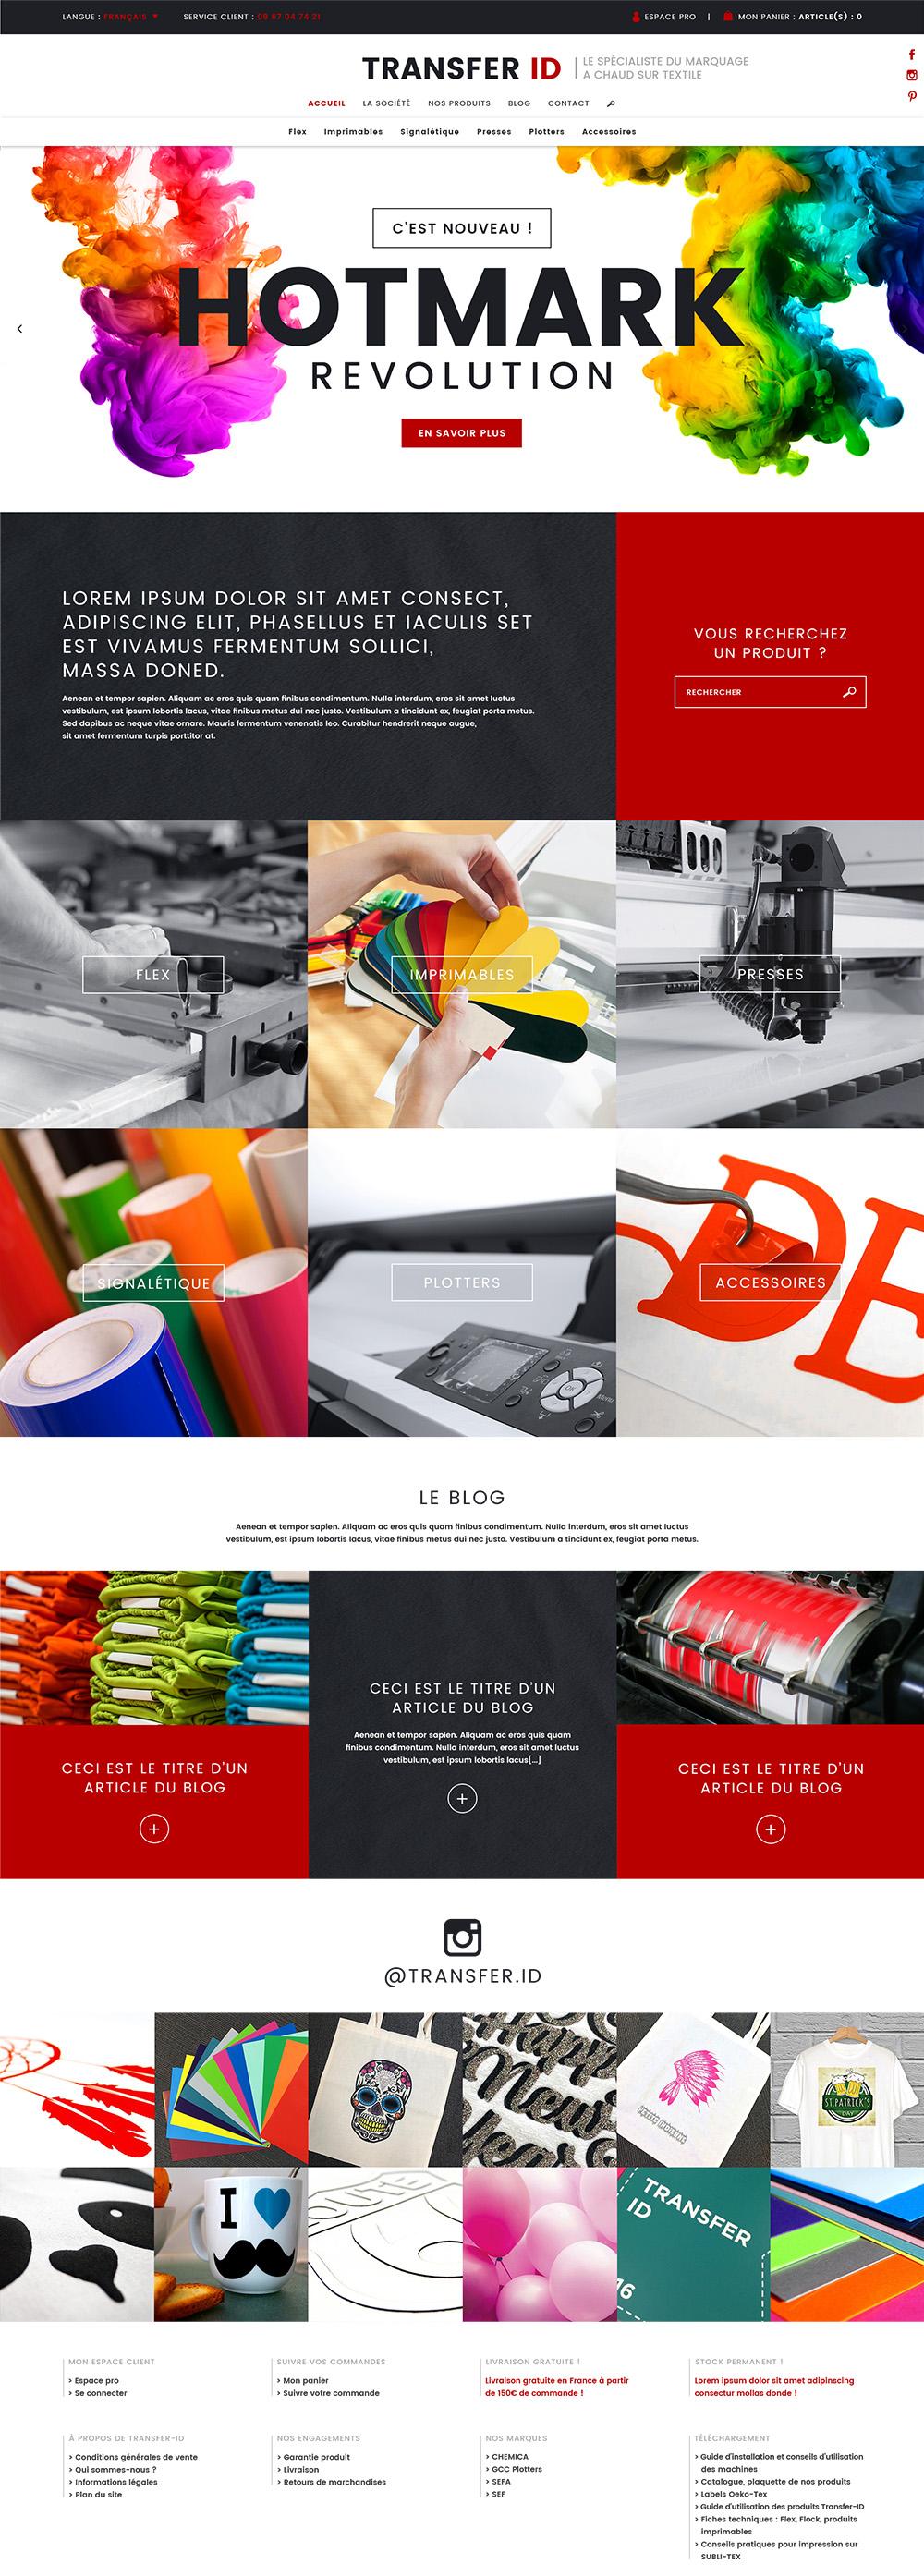 byedel_webdesign_actioncom_transfer_id